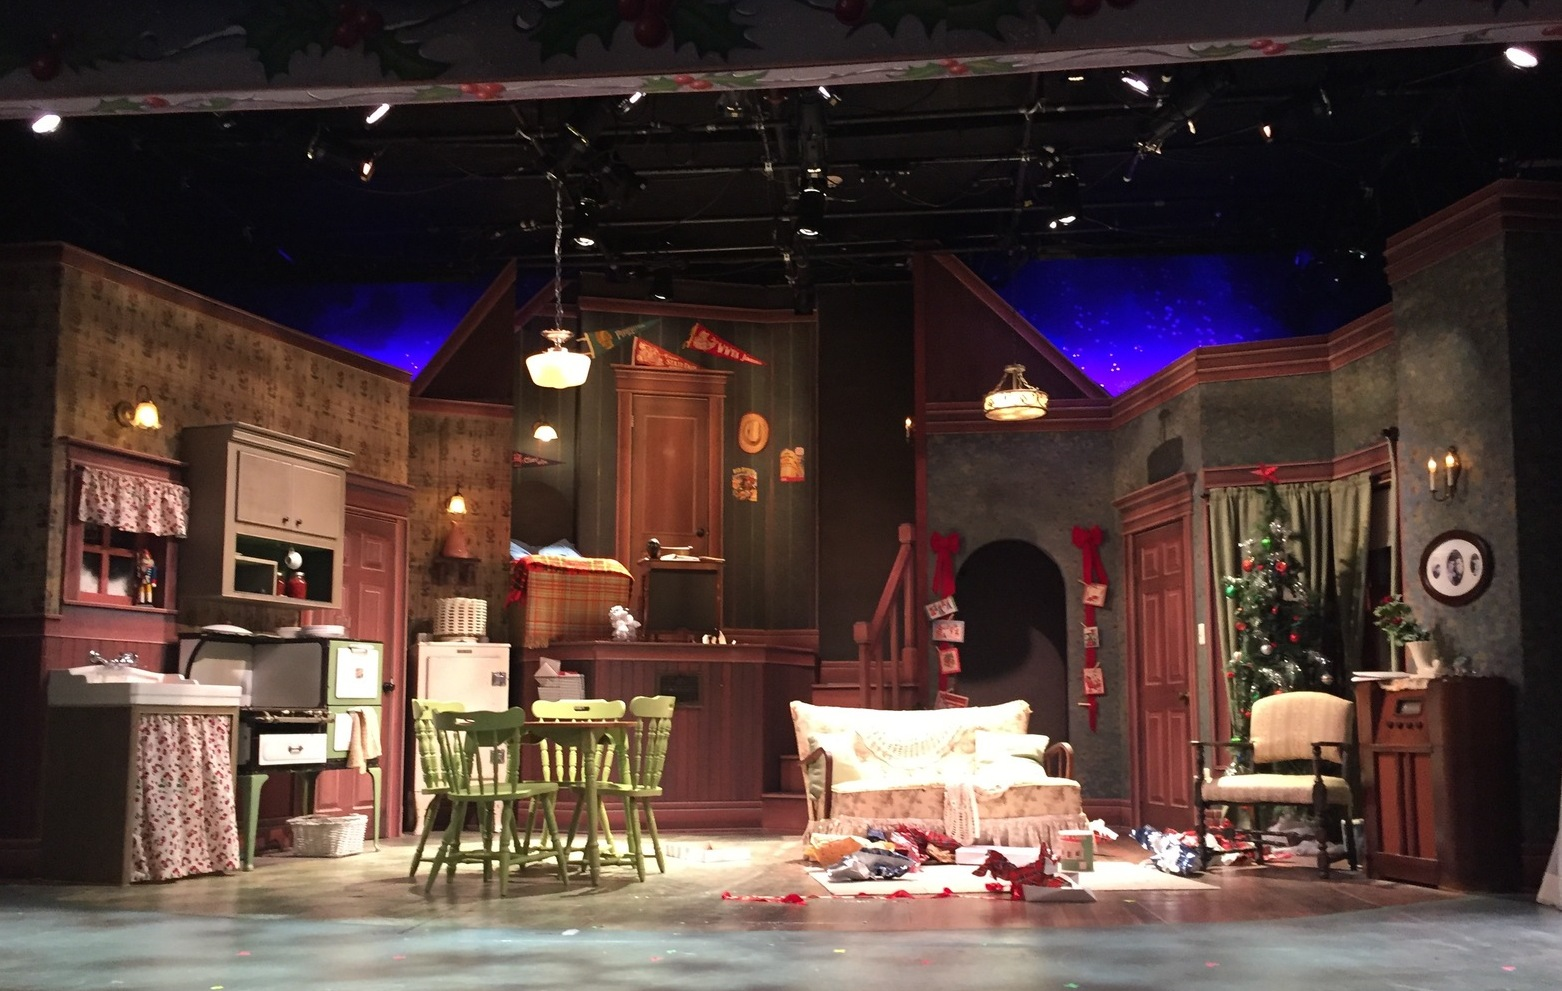 the main set photo by karen salkin - When Is A Christmas Story Set